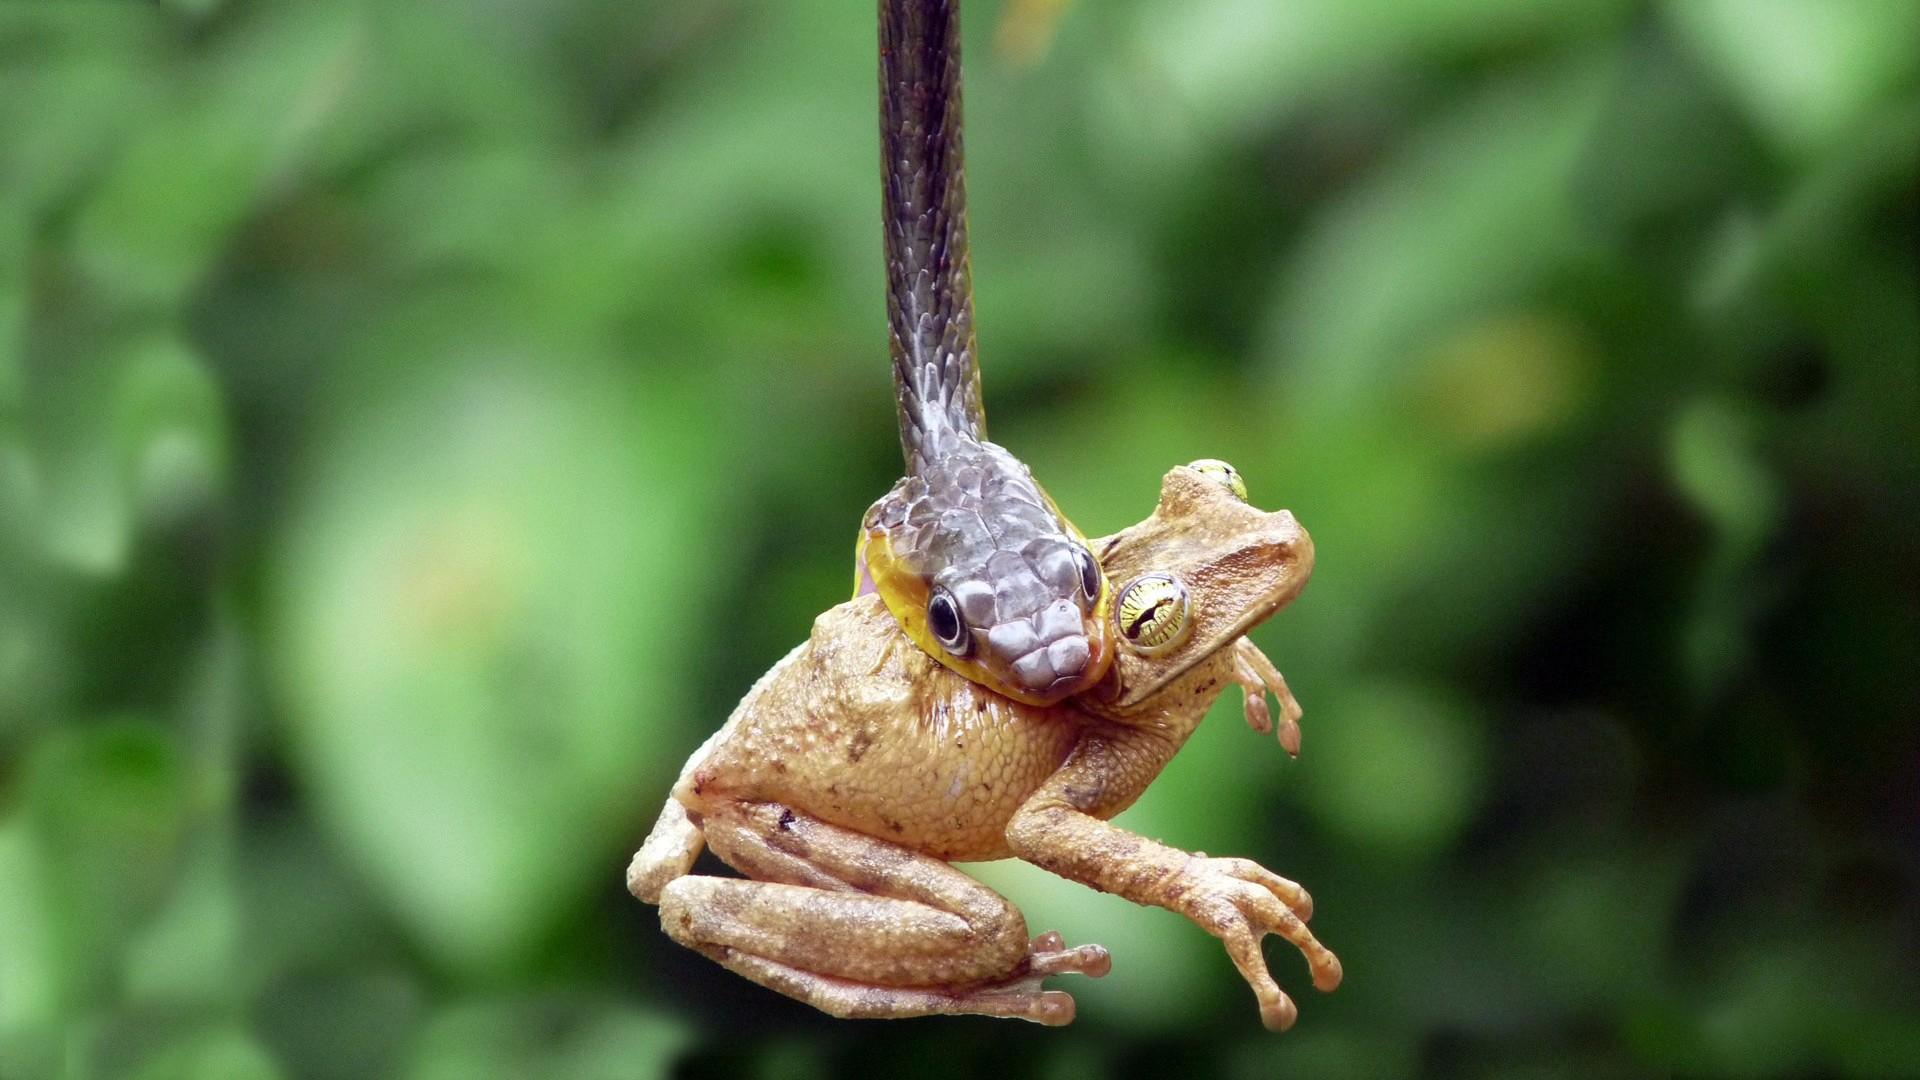 animals frogs snakes reptiles amphibians death battle hunting predator eyes wildife nature wallpaper background